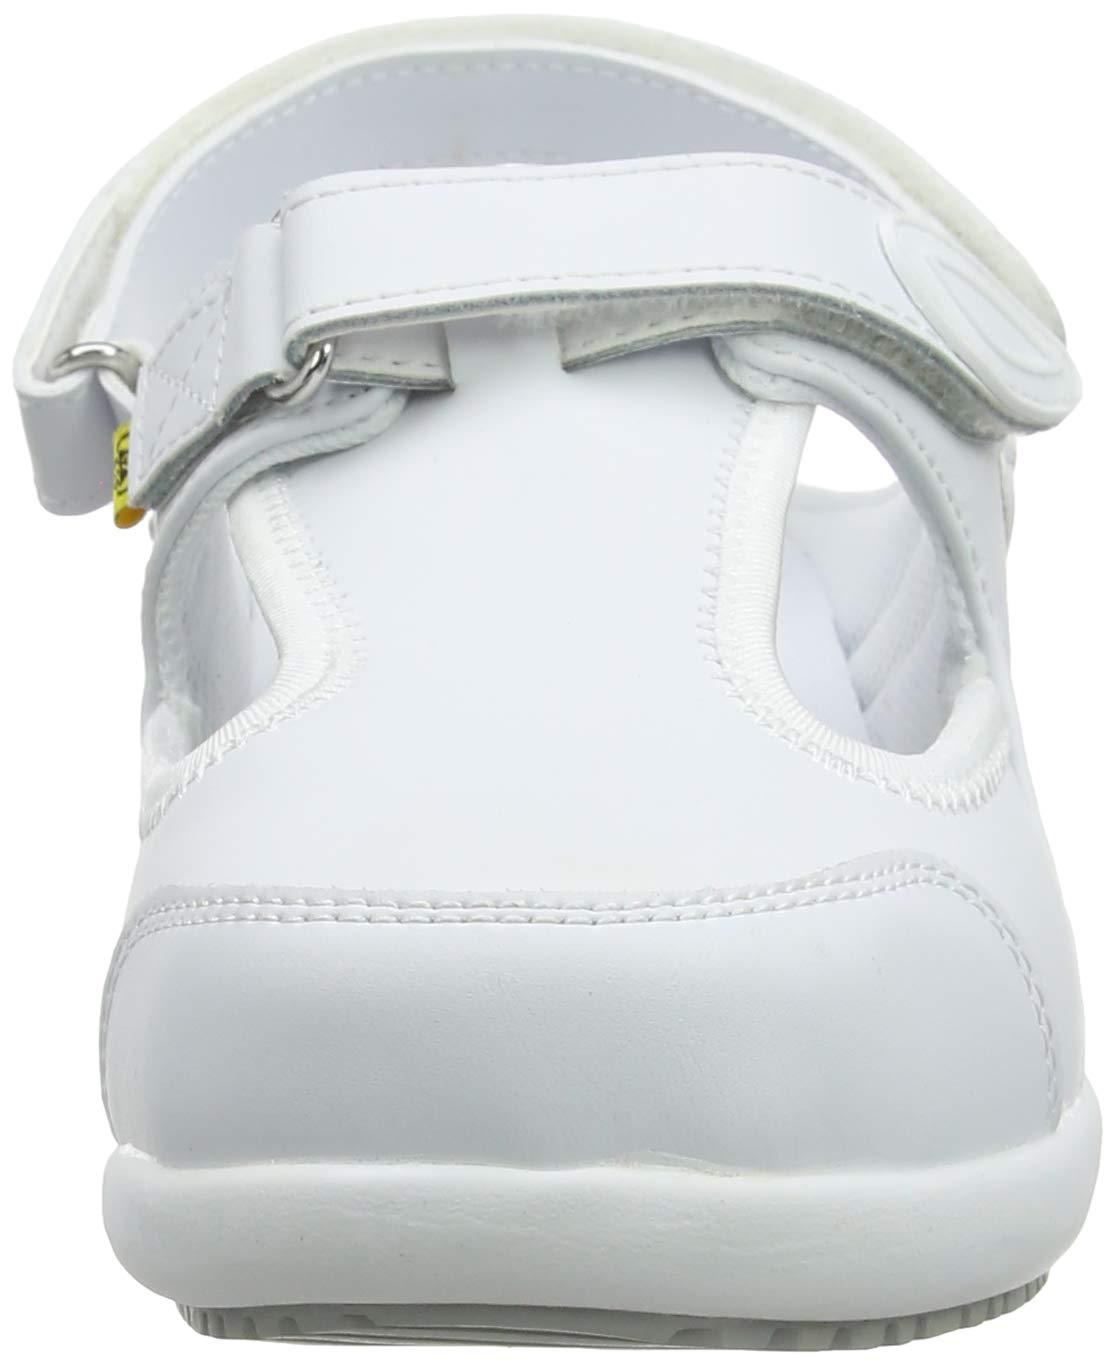 4 UK Fux White EU: 37 Oxypas Move Carin Slip-resistant Antistatic Nursing Shoes